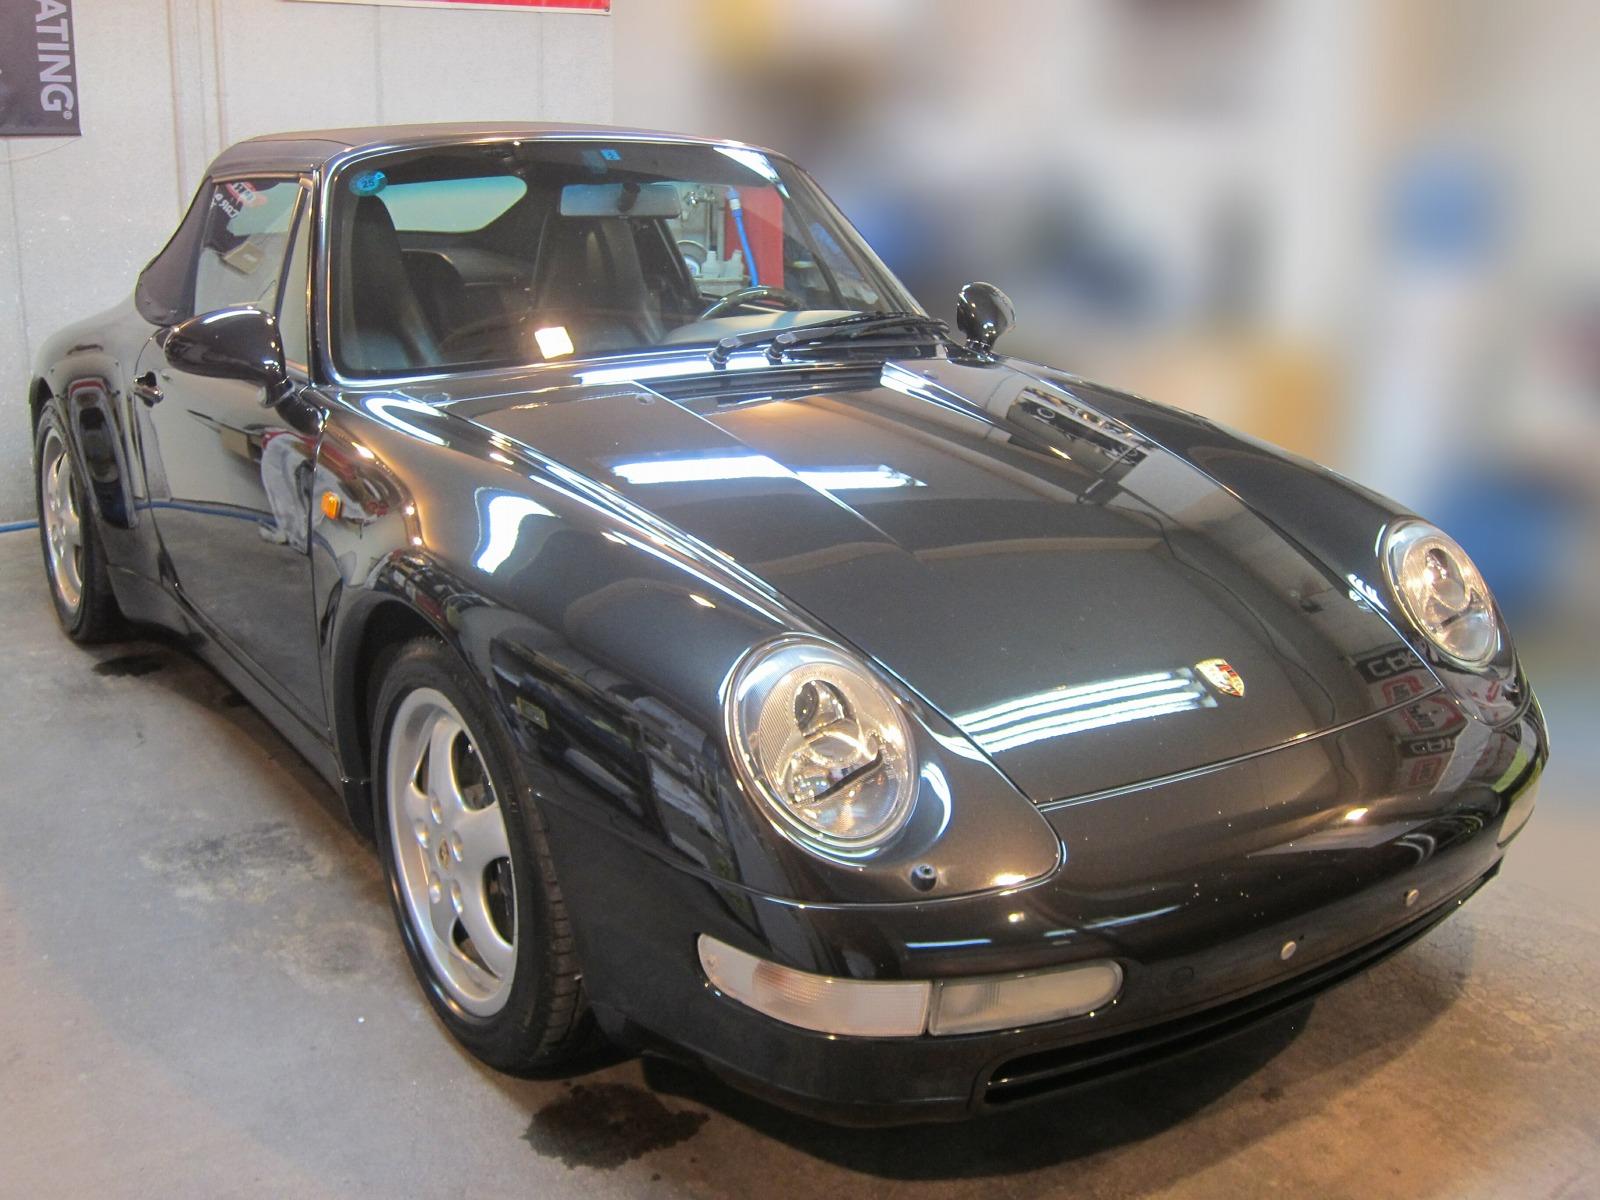 20150909-porsche-911-carrera-cabriolet-02